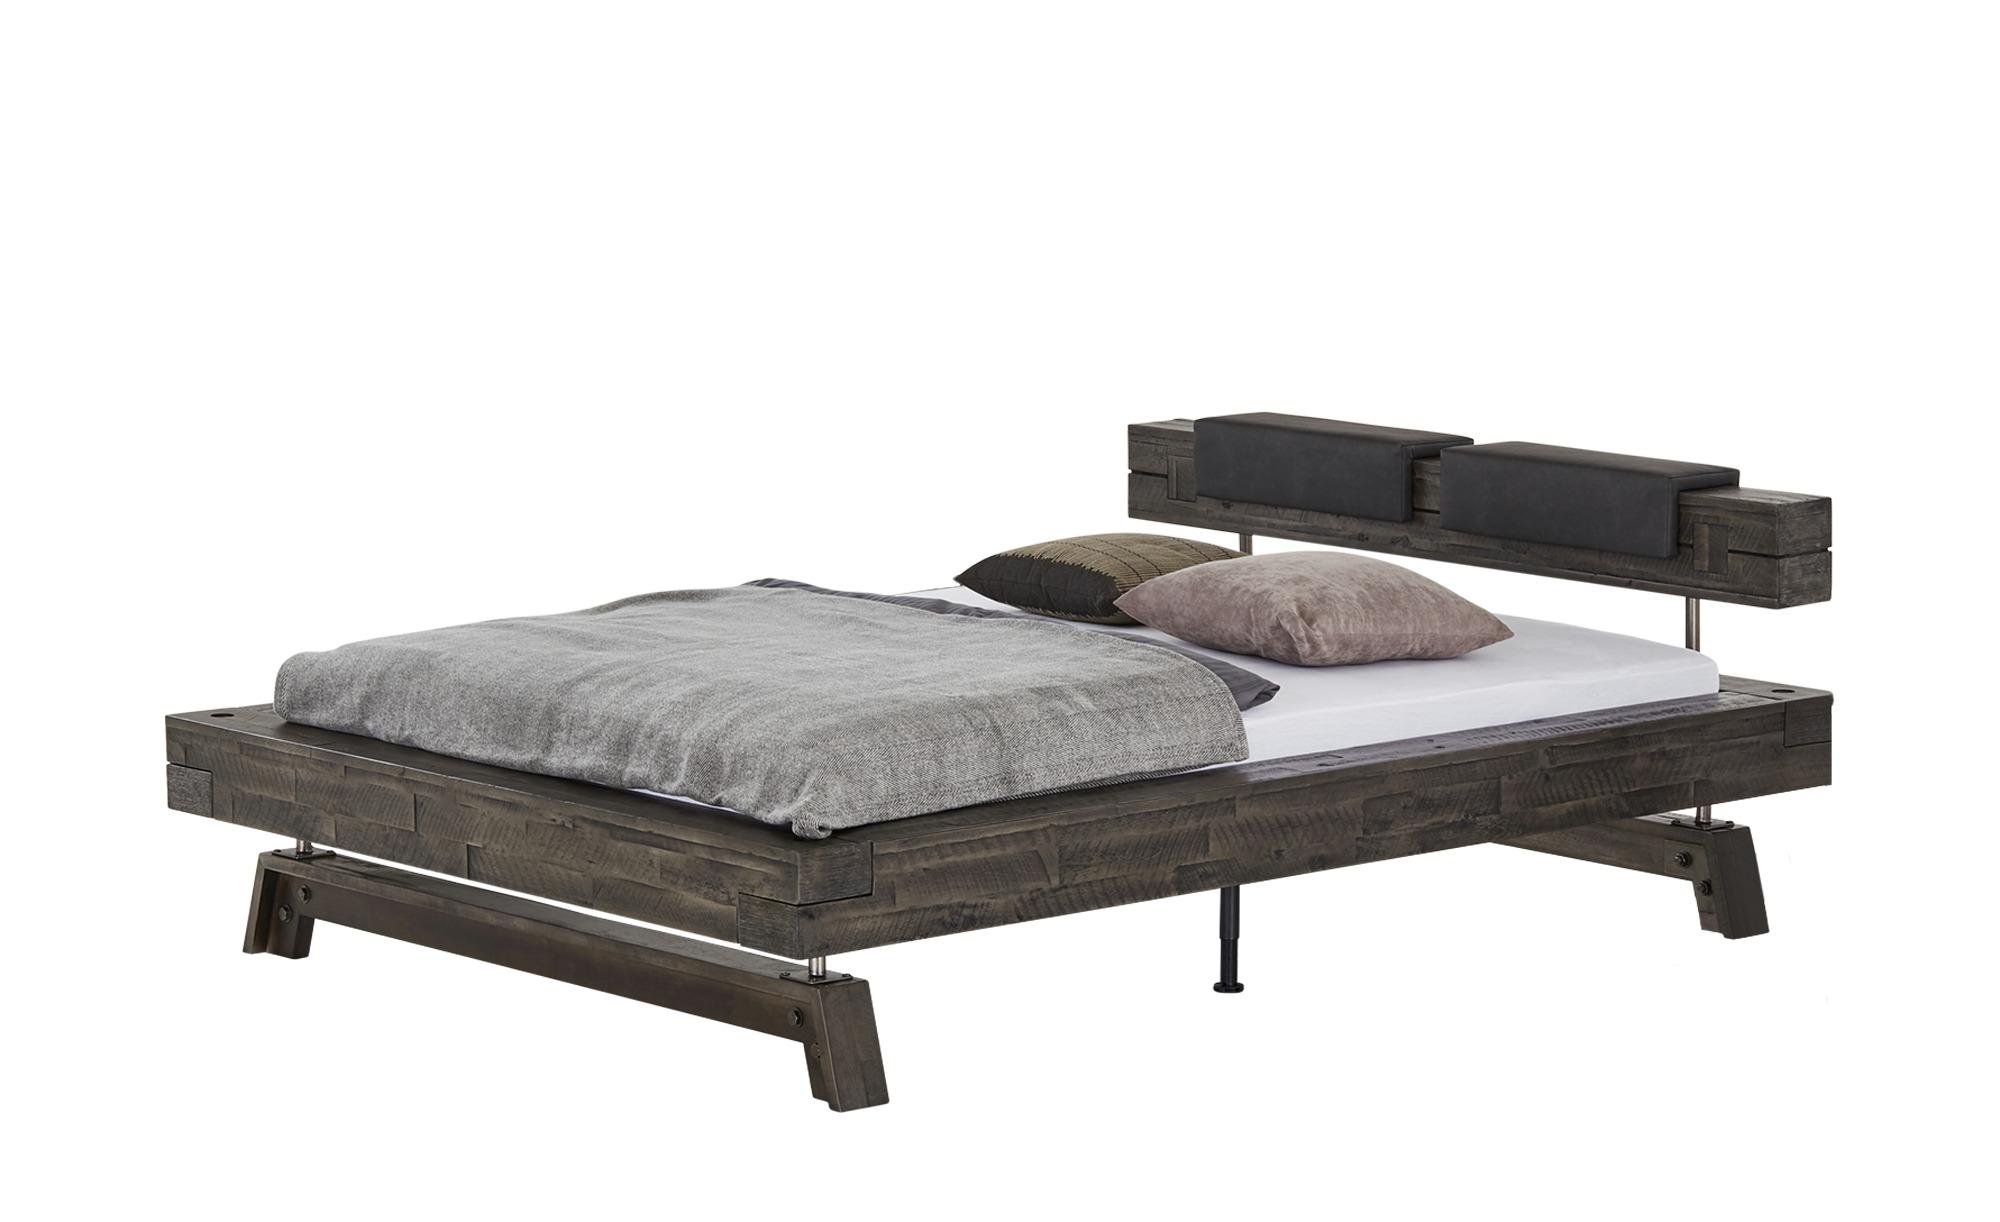 Full Size of Bettgestell Inca 200x220 Cm Mbel Hffner Bett Betten Wohnzimmer Polsterbett 200x220